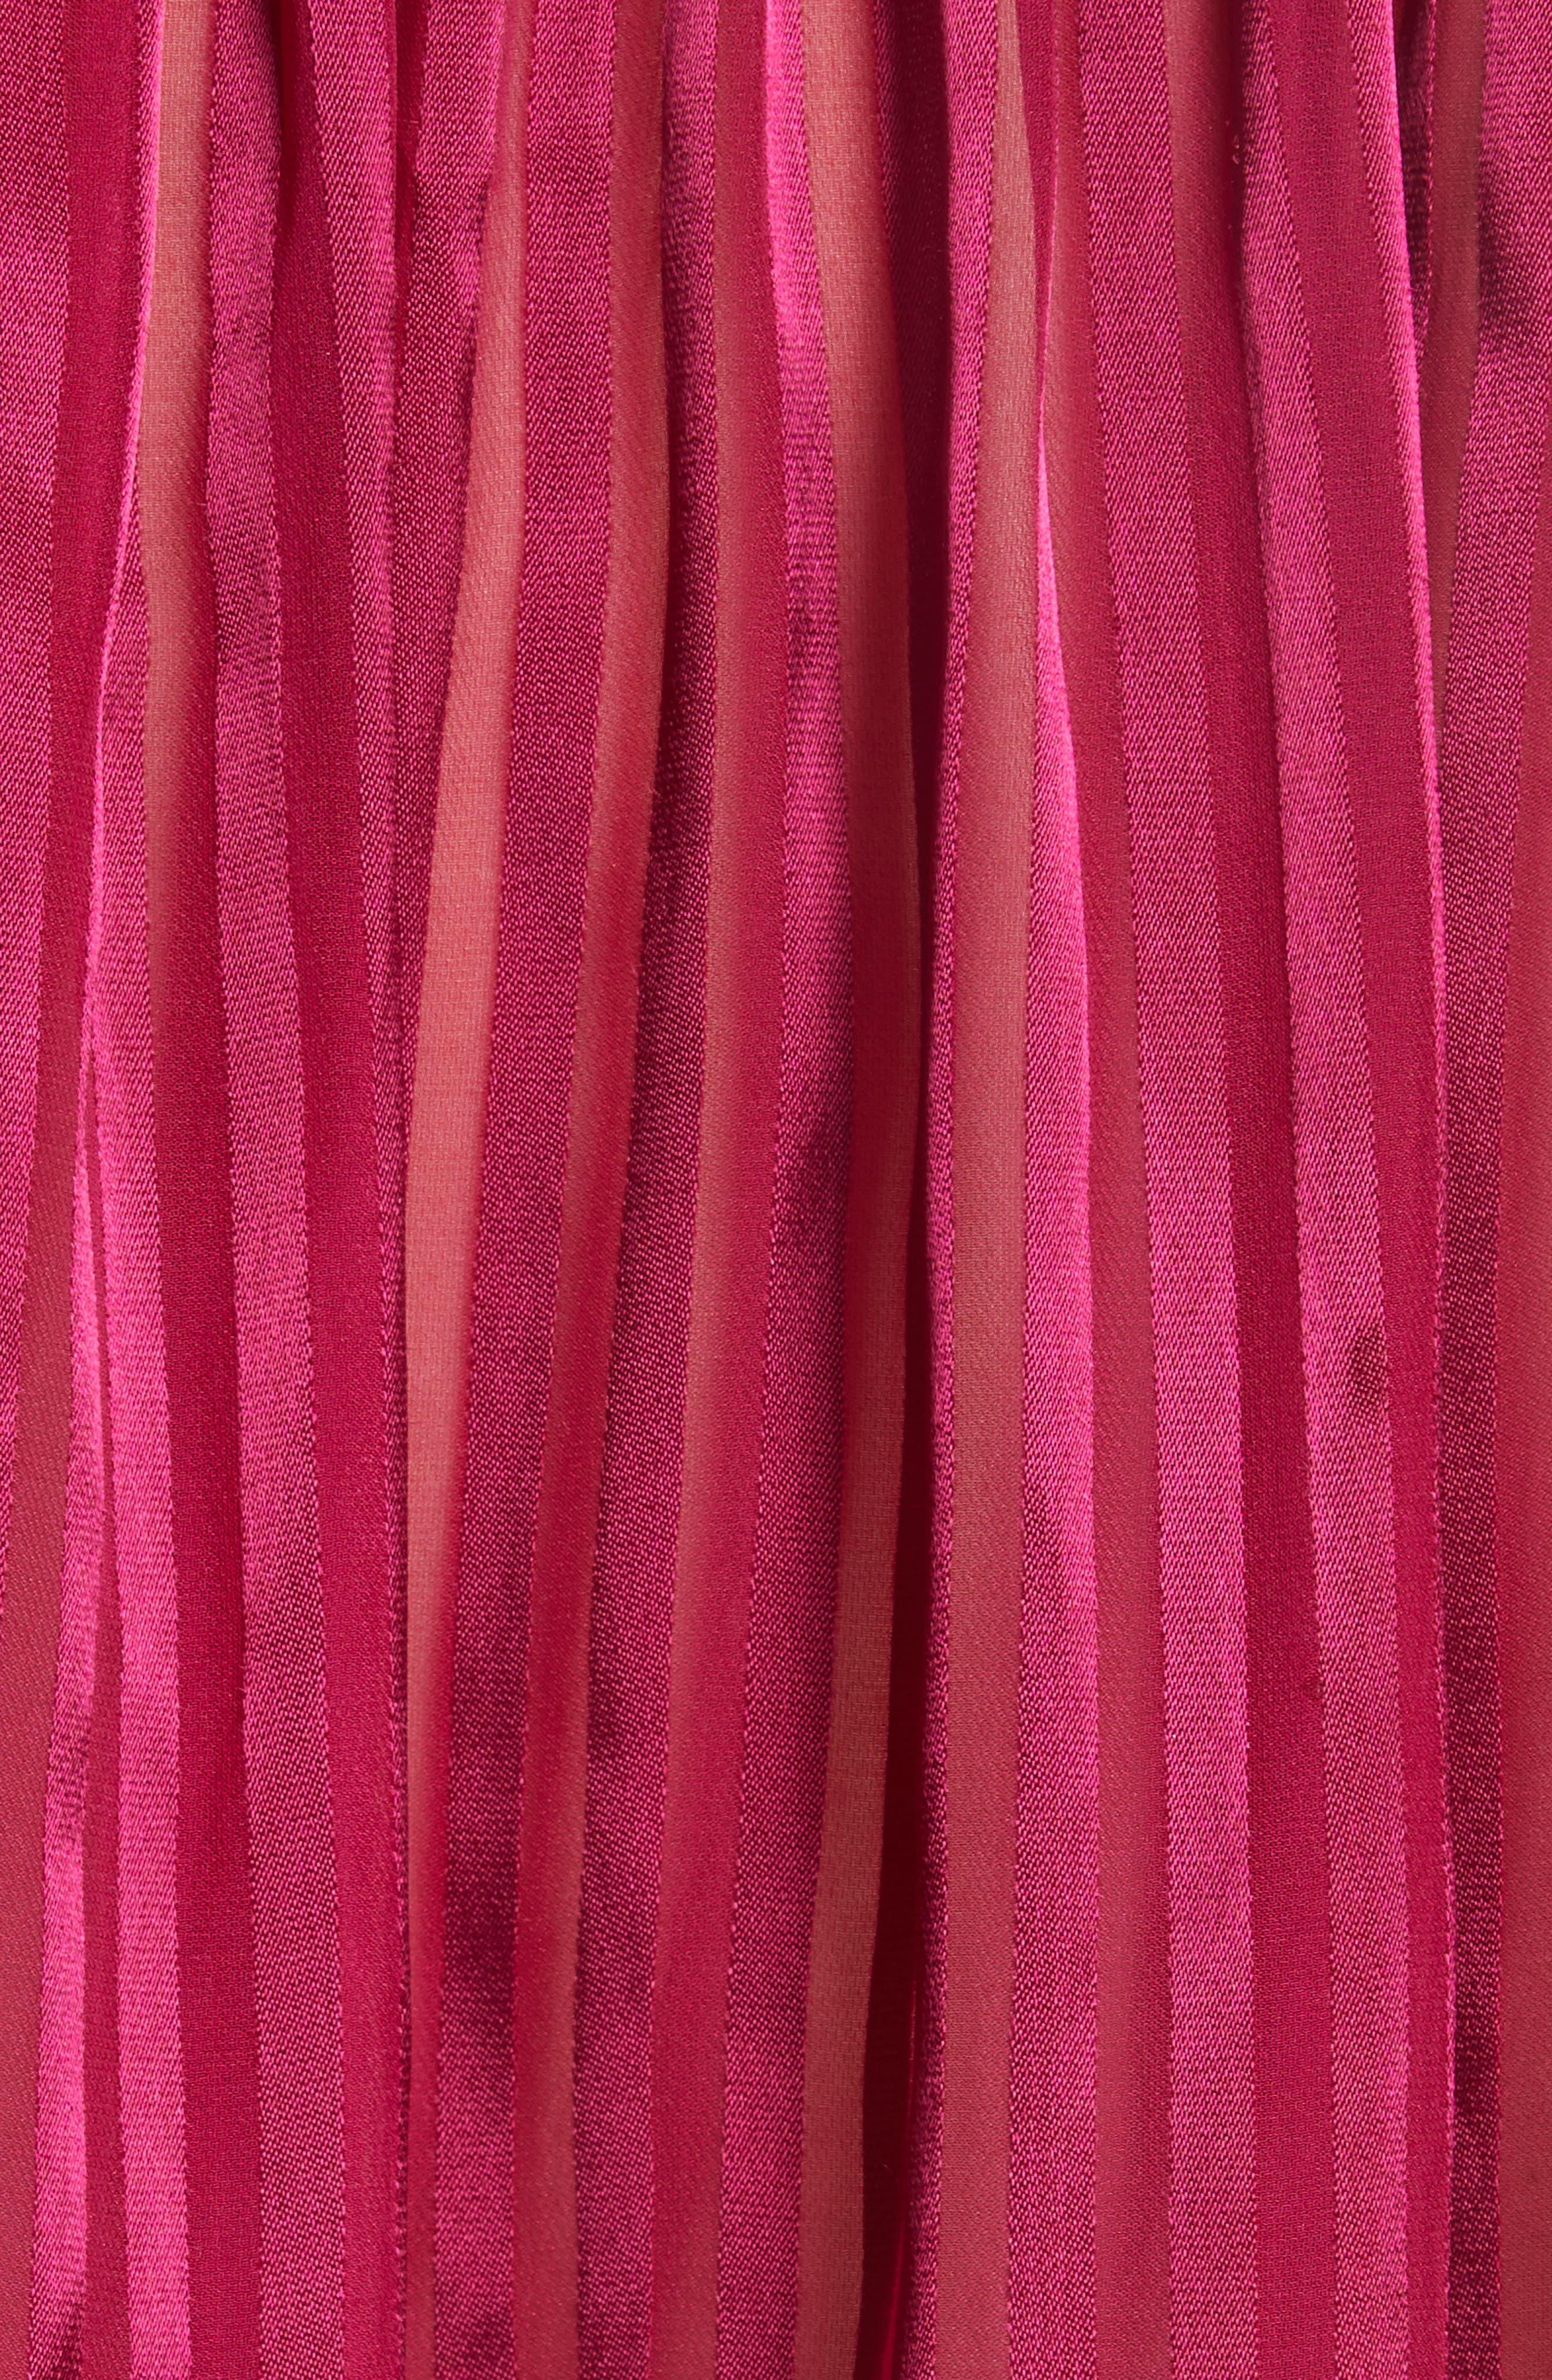 Danika Tie Neck Blouse,                             Alternate thumbnail 5, color,                             694